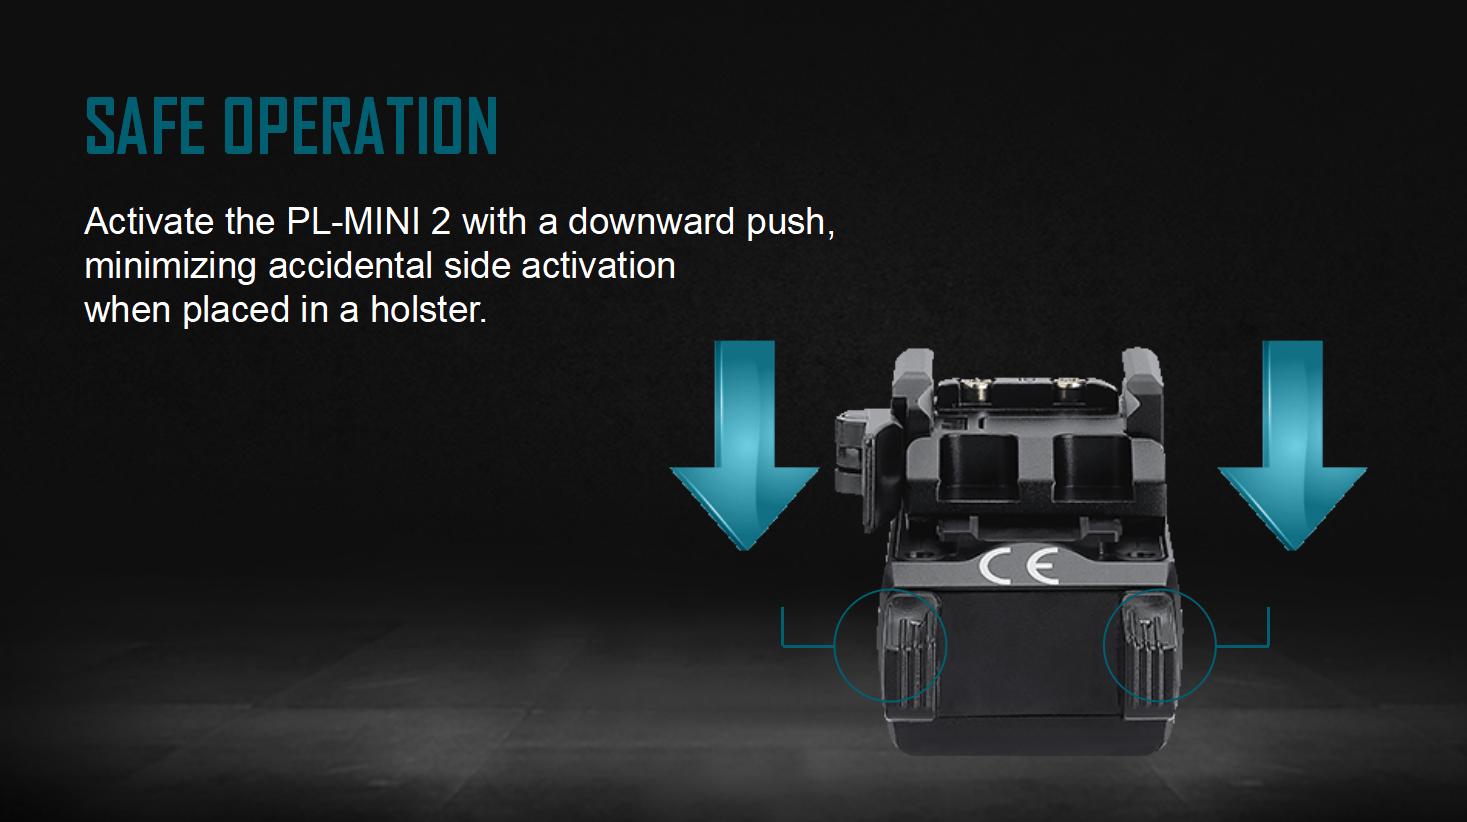 PL-Mini 2 Tactical Flashlight Safe Operation